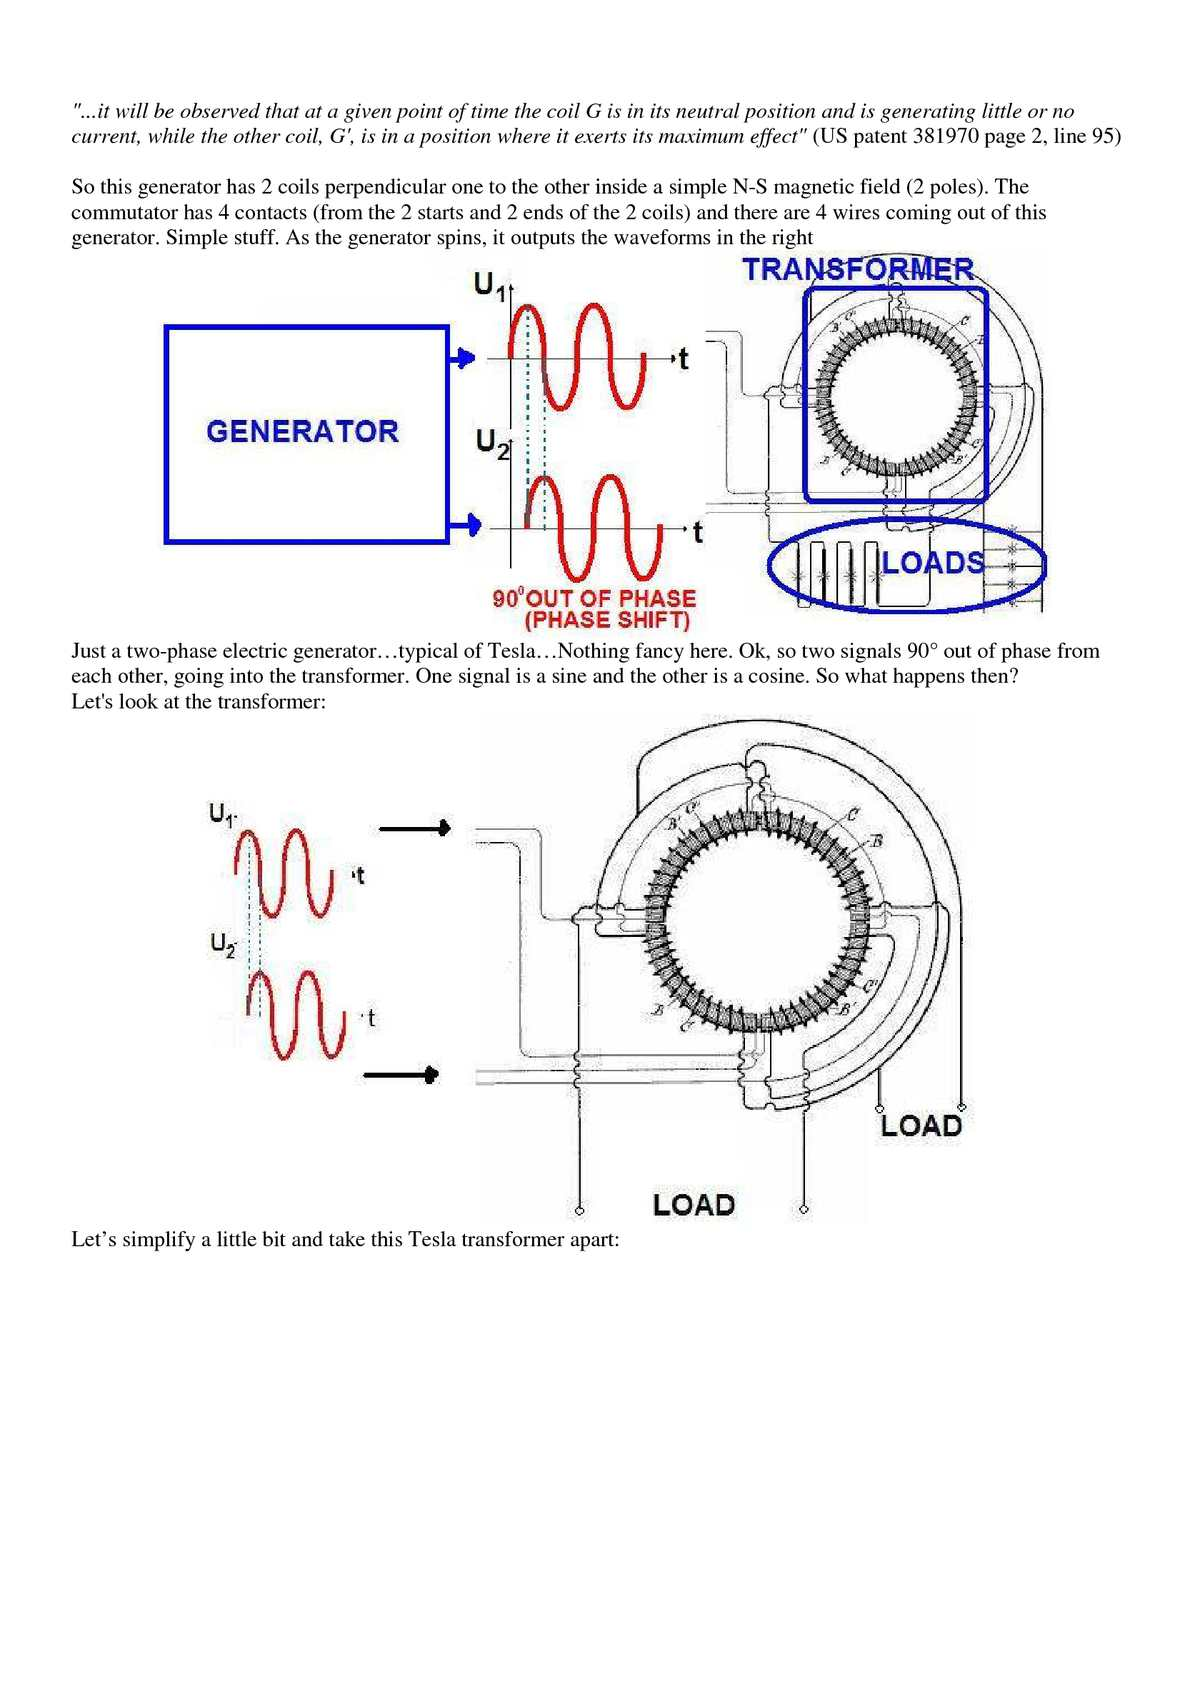 Rodin Coil Wiring Diagram Electrical Diagrams Tesla 02 Saturn Sl1 Fuse Coils Correct